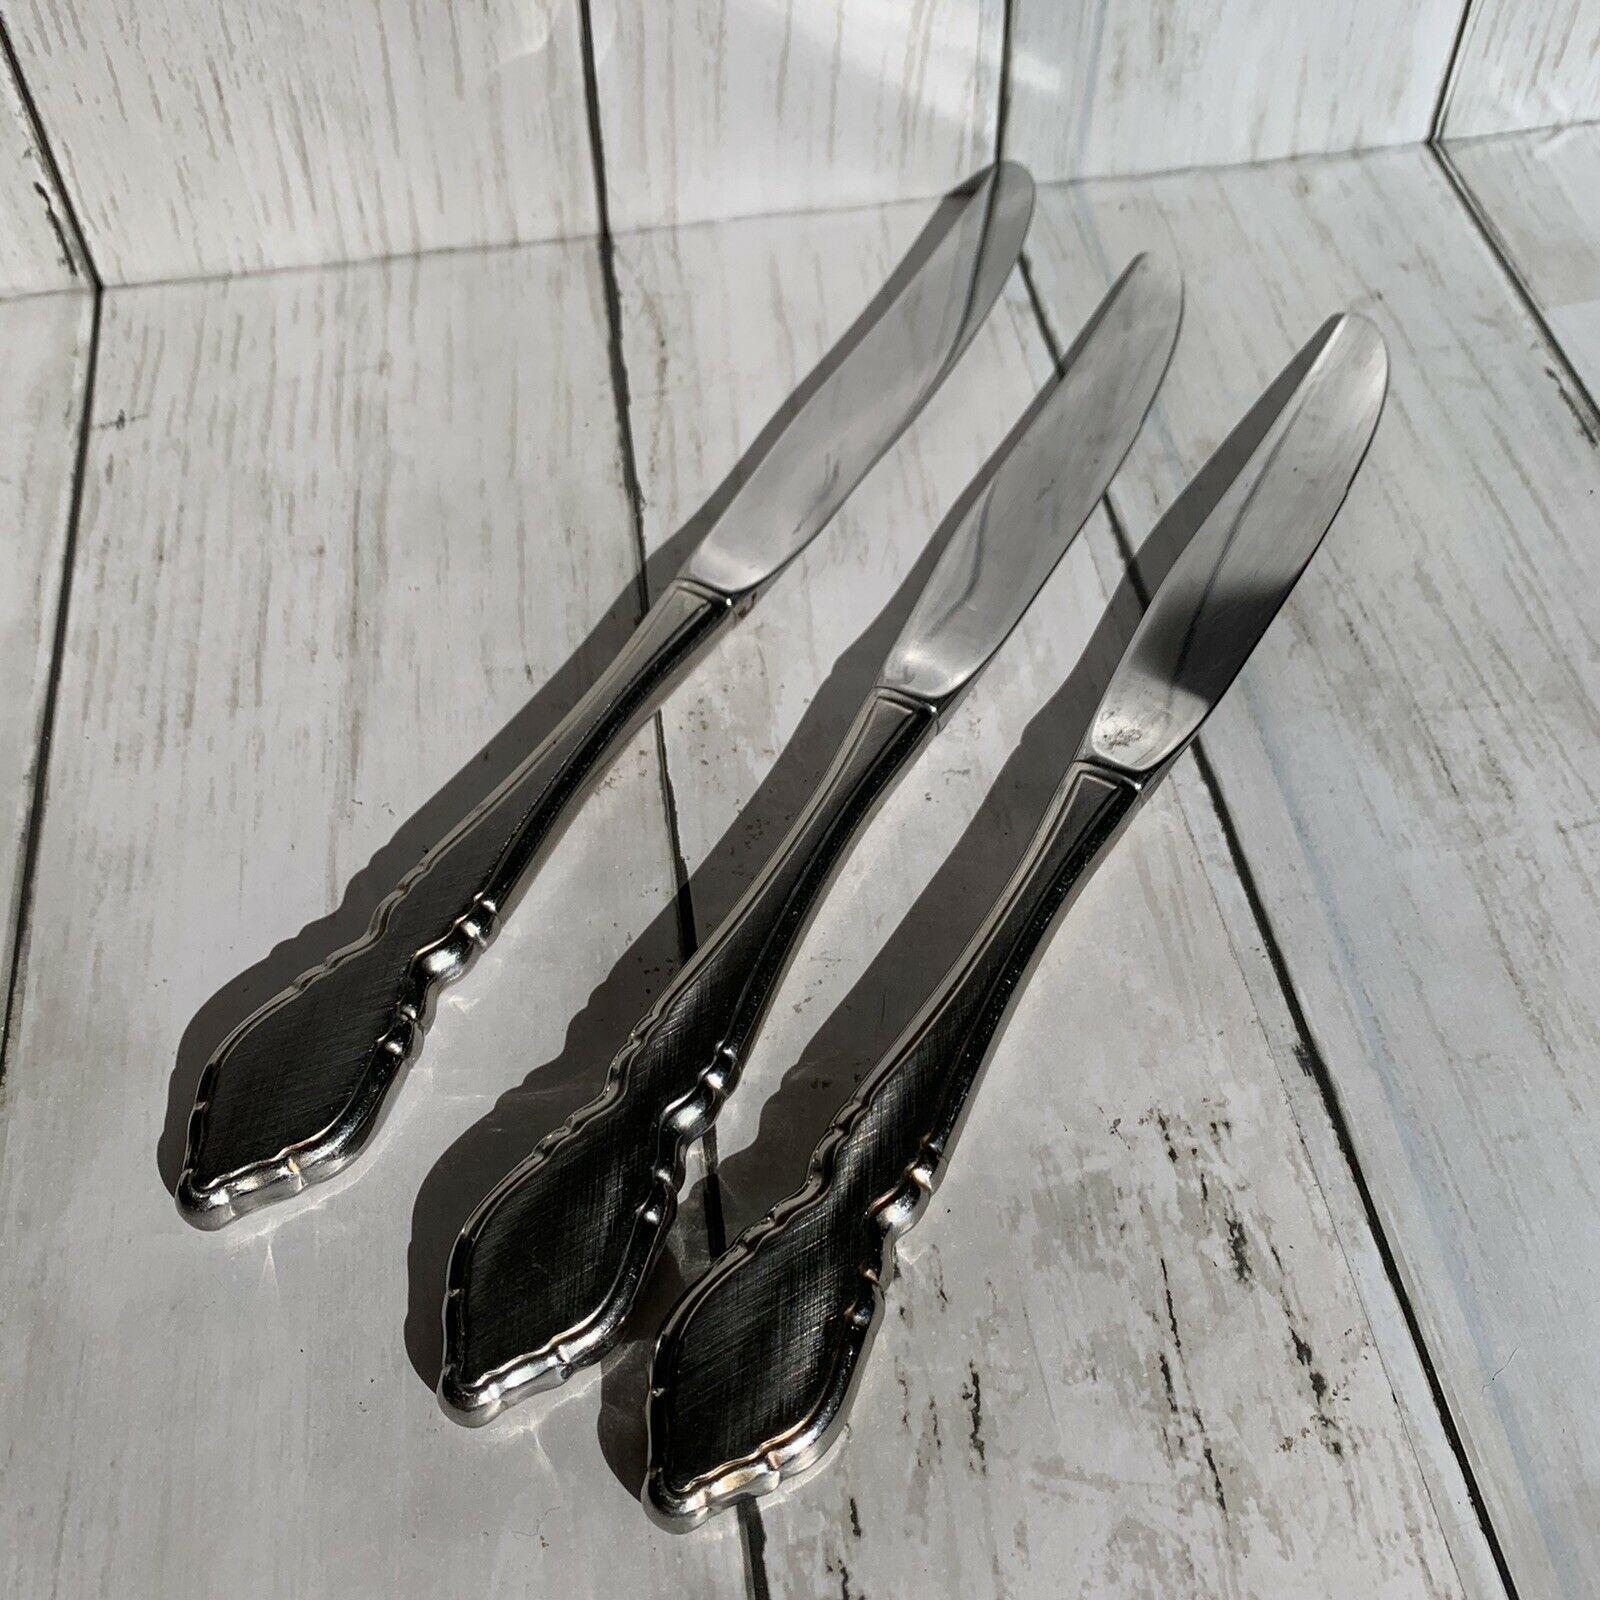 3 Butter Knives Hollow  Oneida CLASSIC MOOD DEAUVILLE PRESCOTT Stainless OCO - $12.86